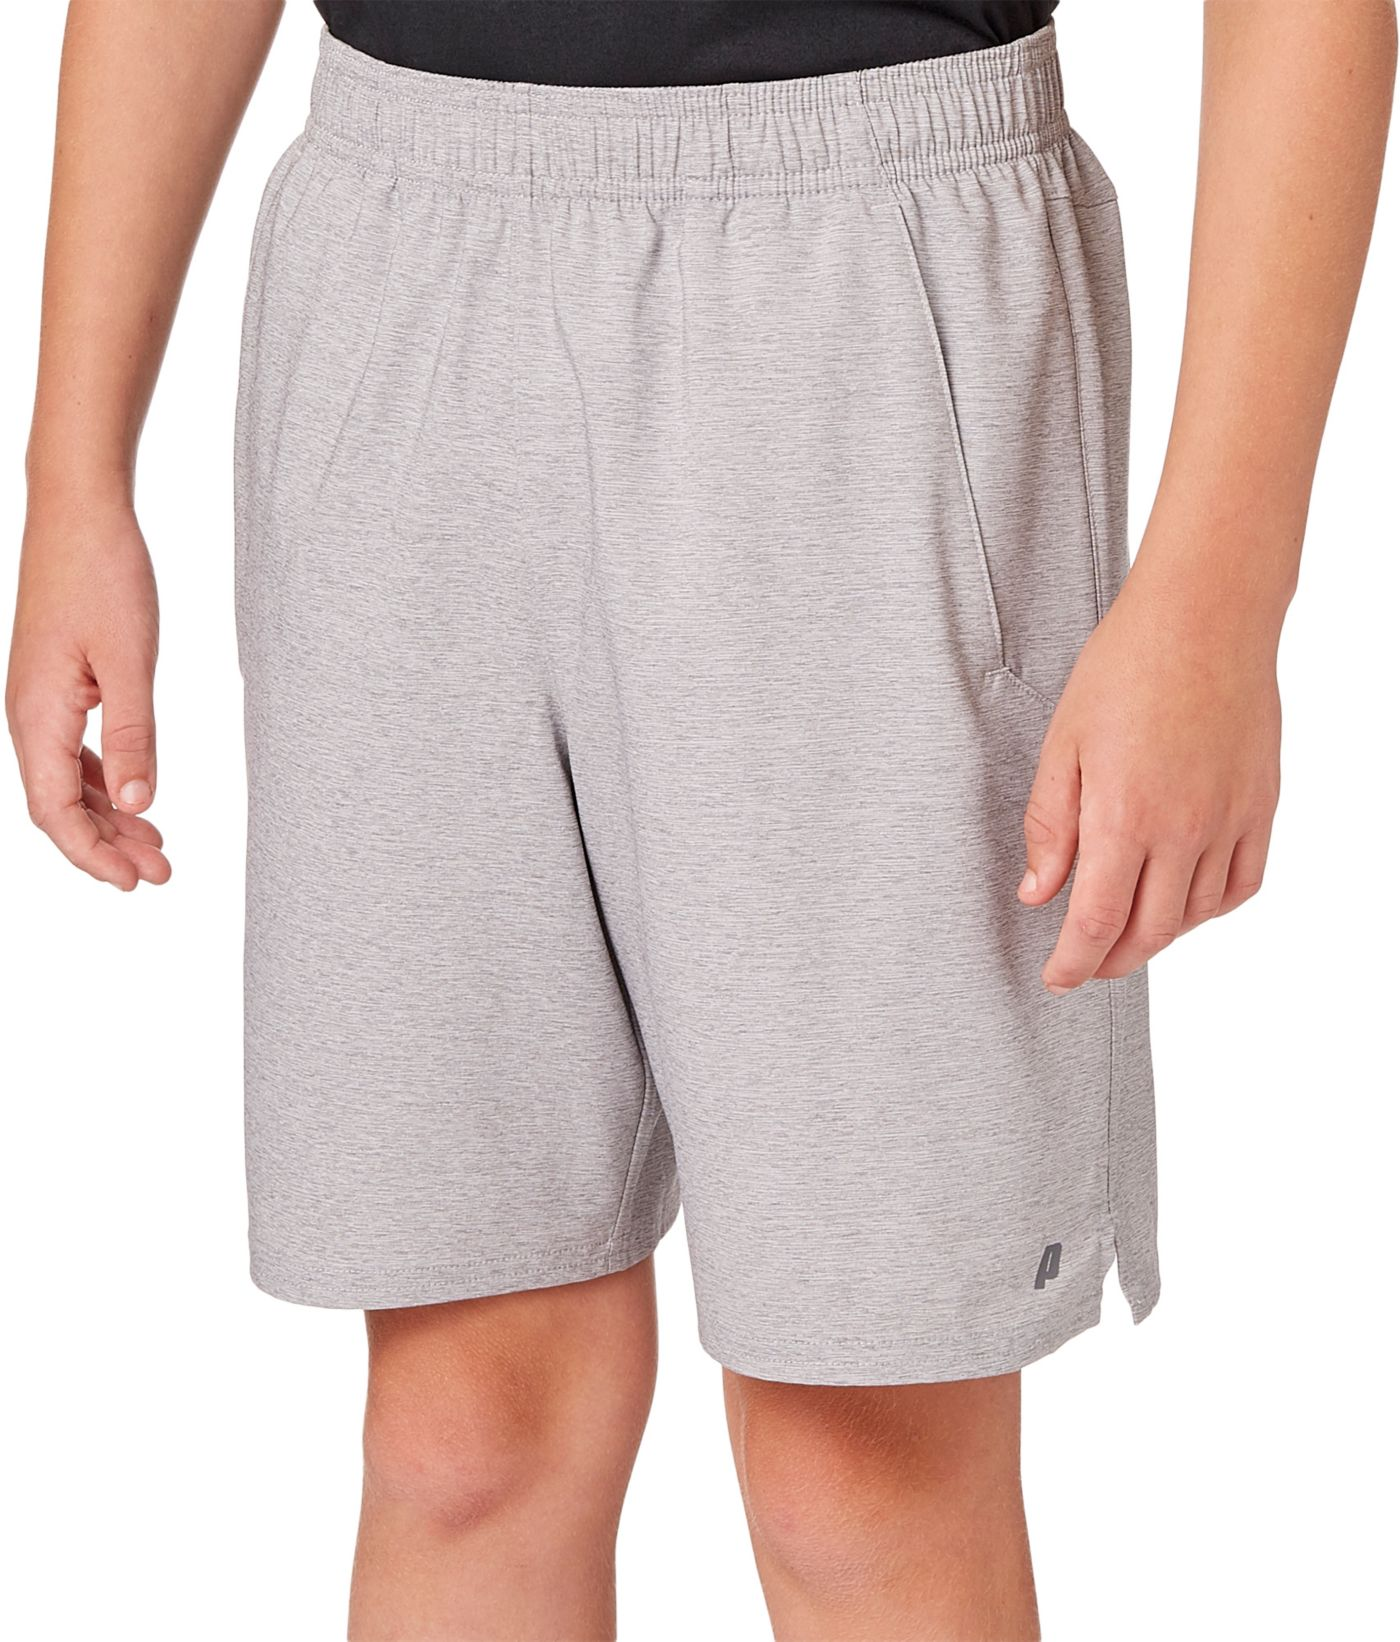 Prince Boys' Match Woven Shorts